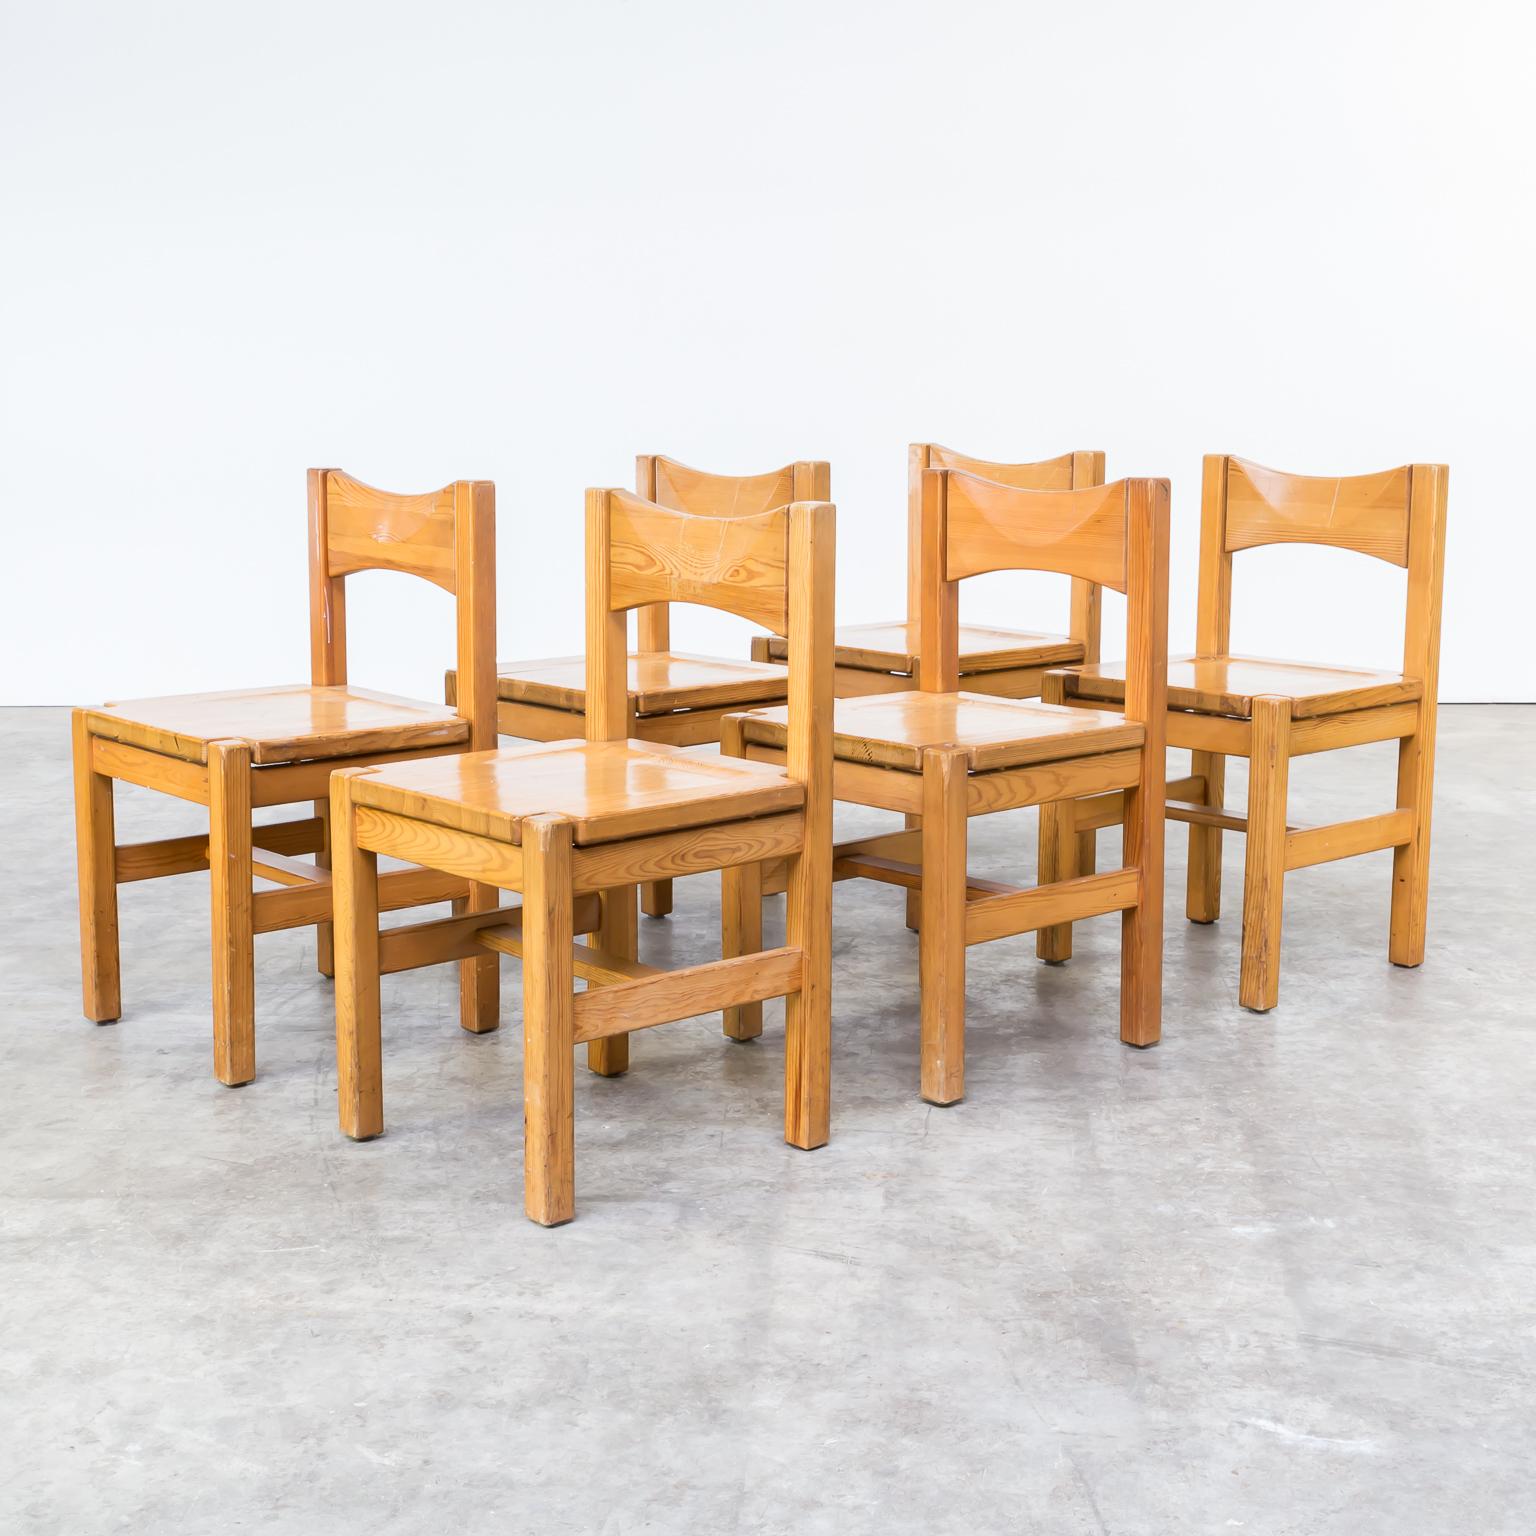 0512047ZST Ilmari Tapiovaara Laukaan Puu Pine Dining Chair Stoel Vintage